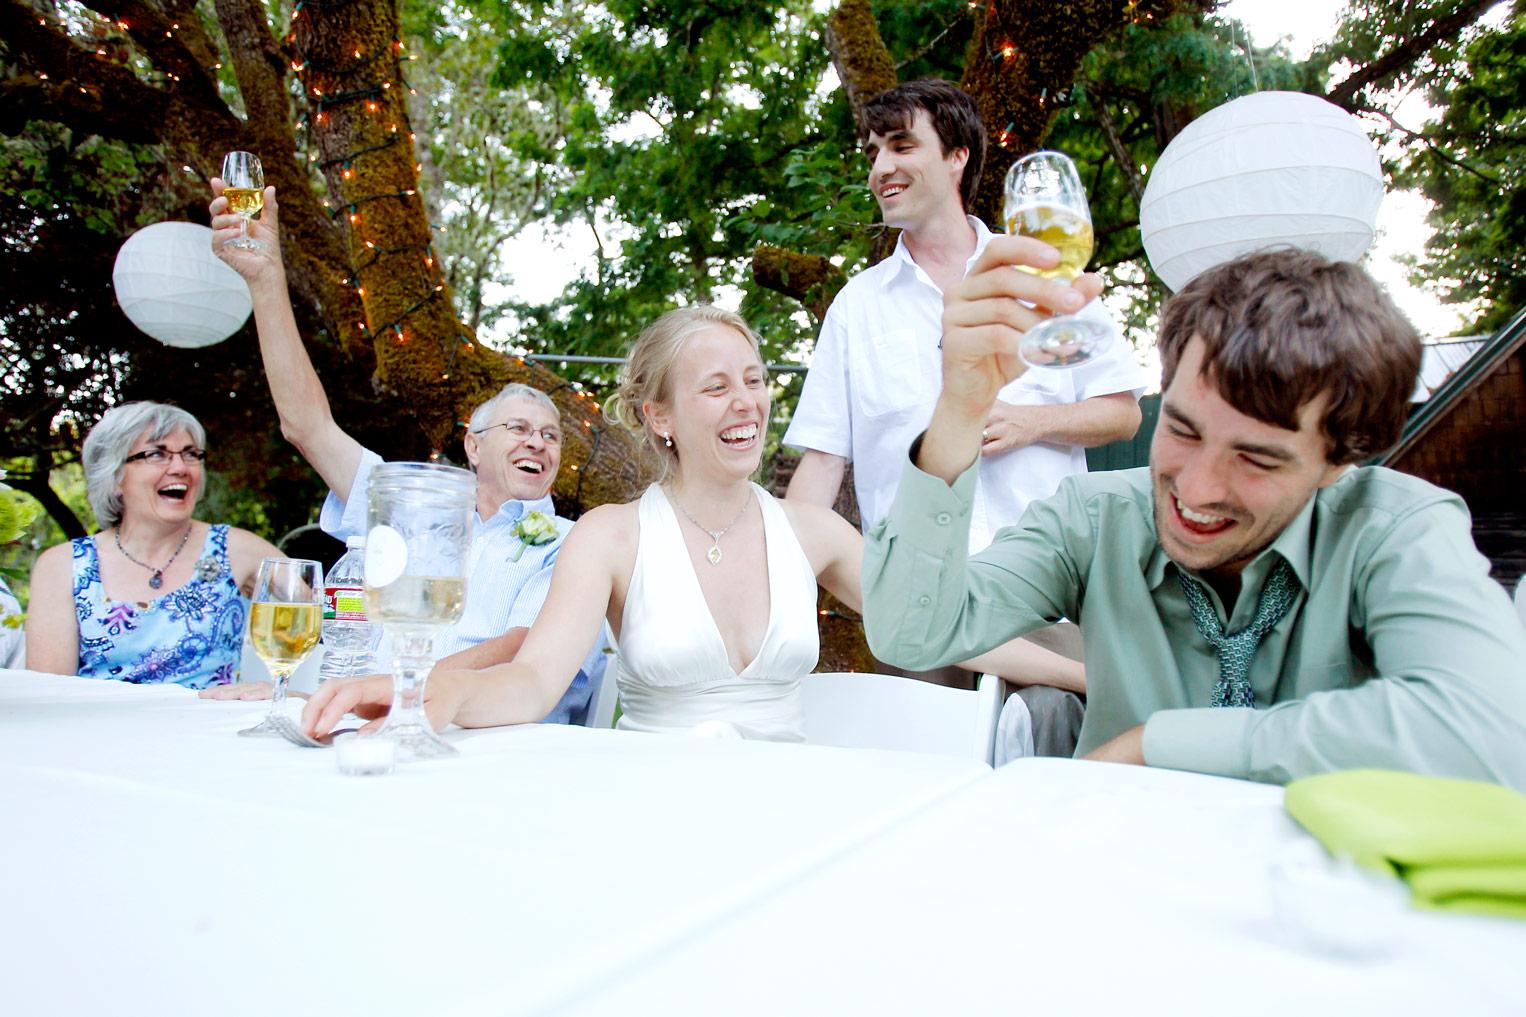 rustic-outdoor-trinity-river-wedding-ruthie-hauge-photography-34.jpg